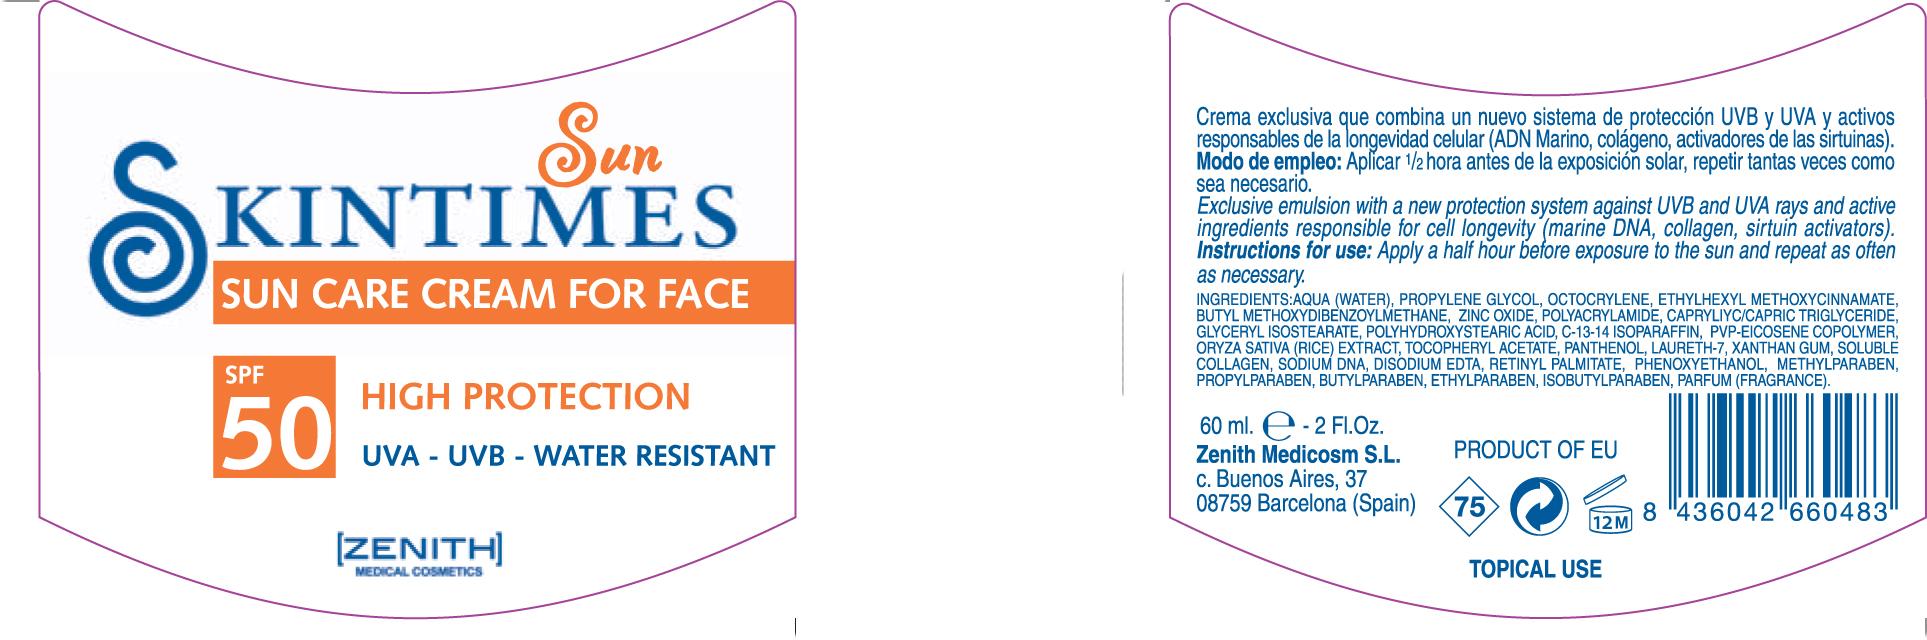 Sun Care For Face (Octinoxate Avobenzone Zinc Oxide Octocrylene) Cream [Zenith Medicosm Sl]